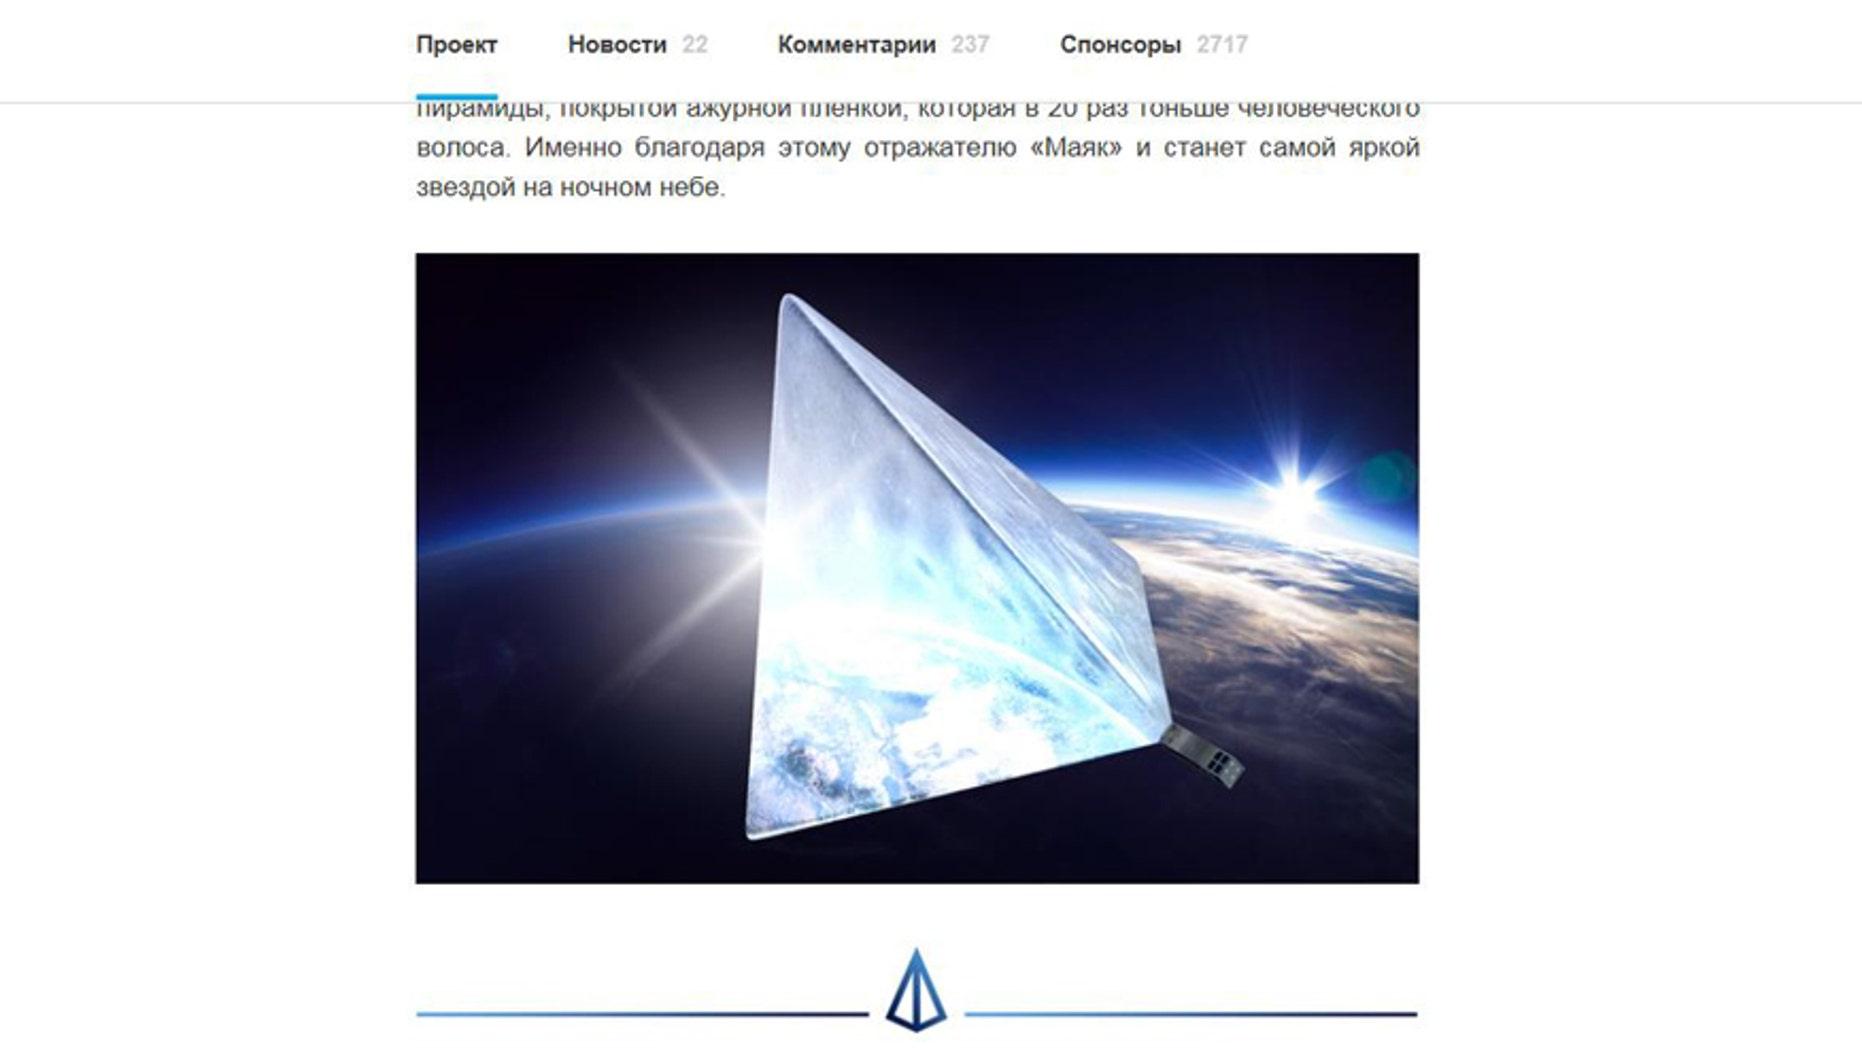 (Screenshot from Boomstarter.ru, artists' impression of the Mayak CubeSat)